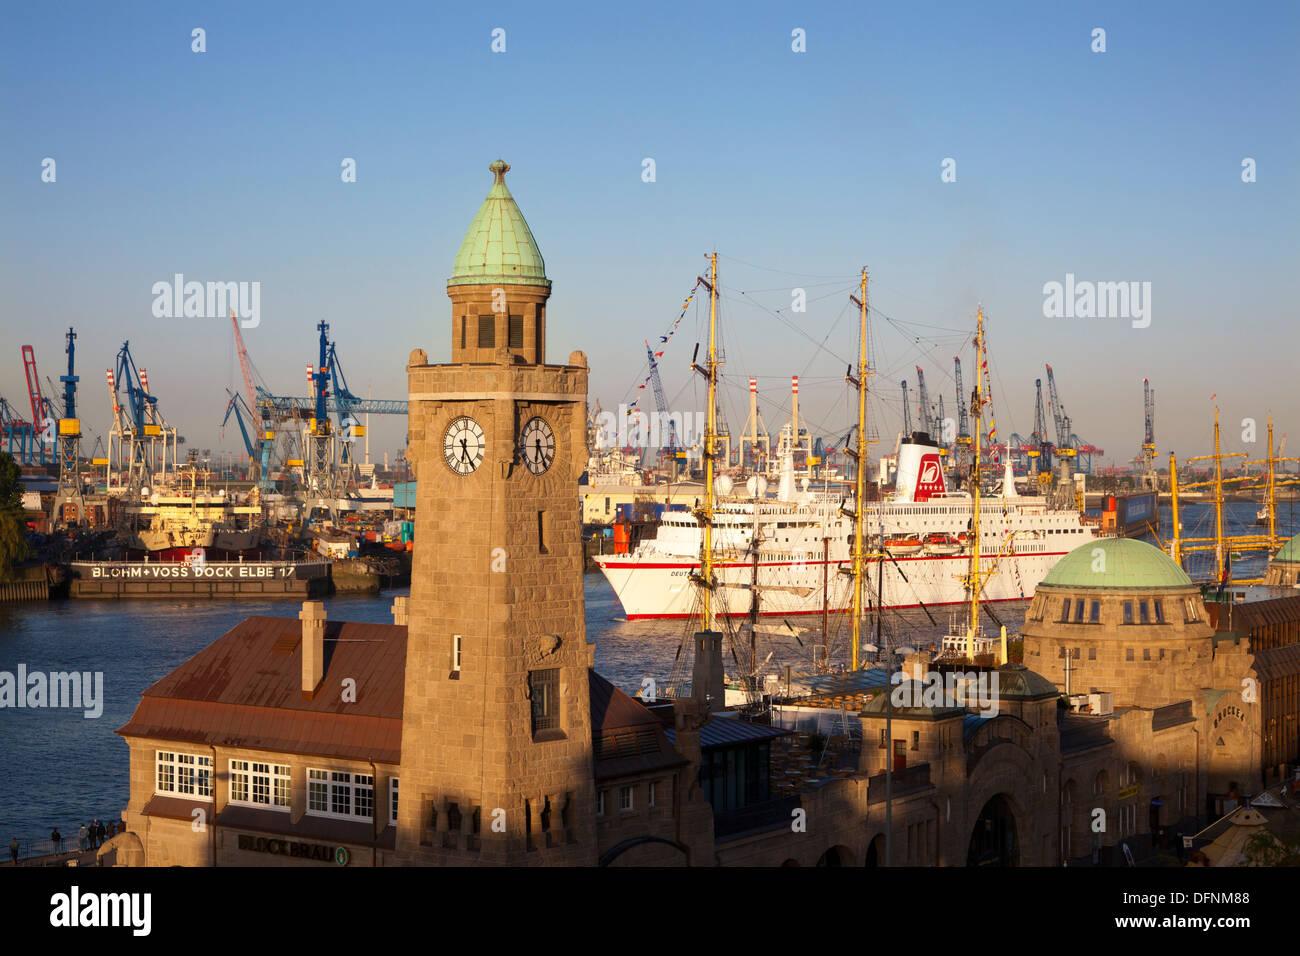 Cruise ship MS Deutschland entering port at the tower of St. Pauli Landungsbruecken, Hamburg, Germany, Europe Stock Photo